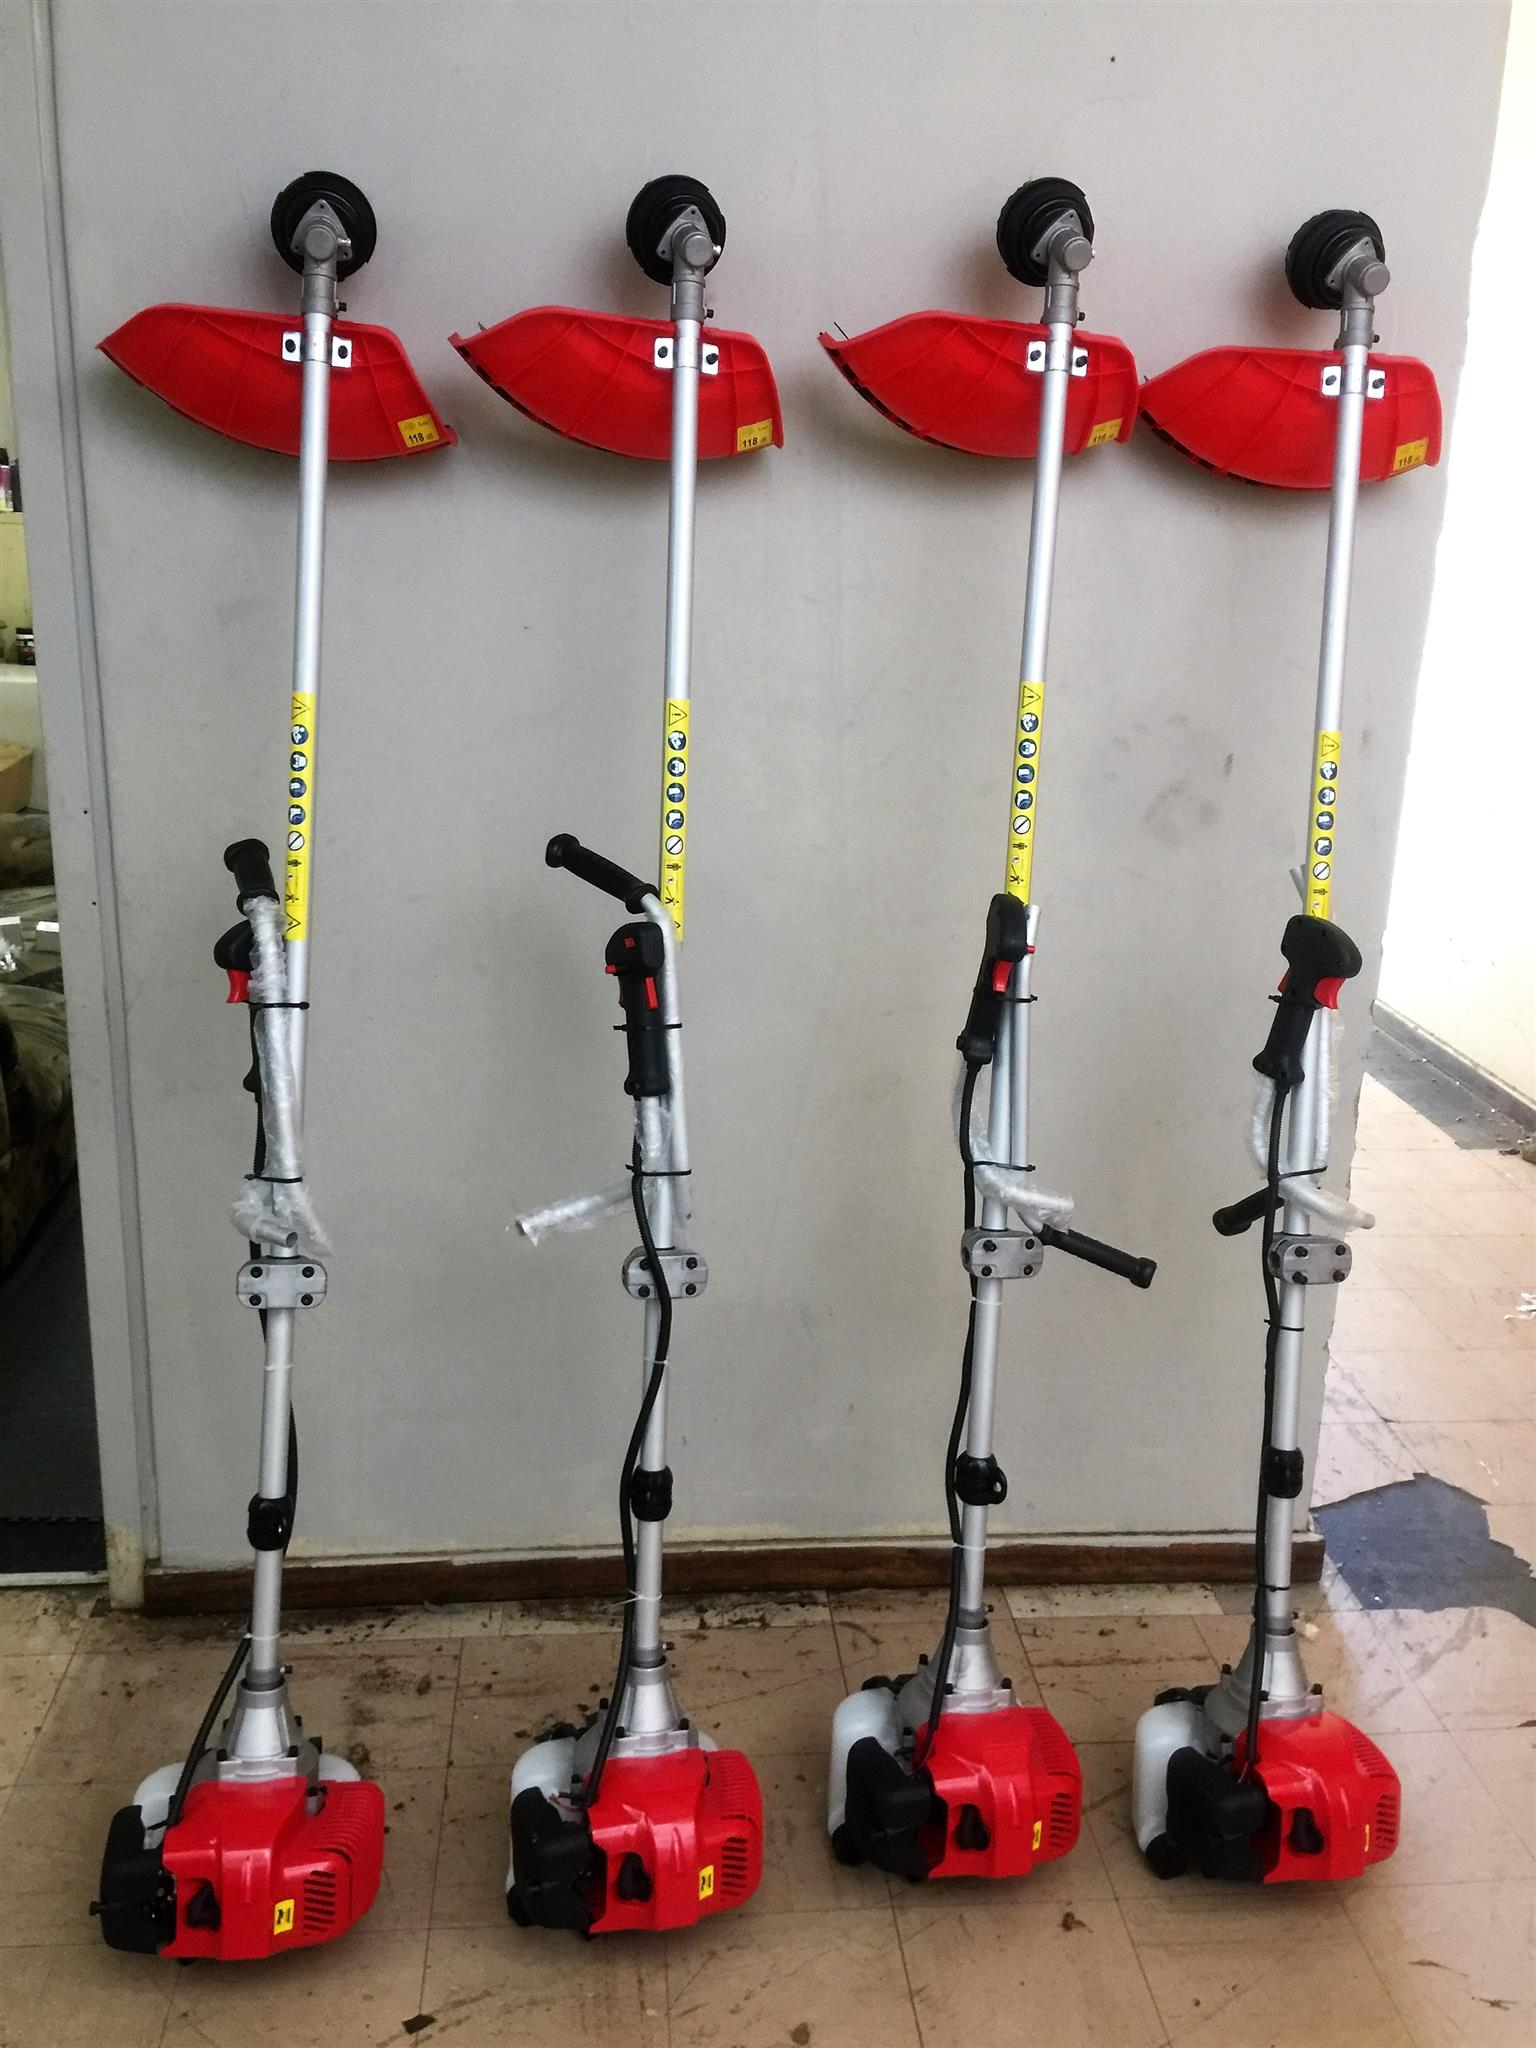 brush cuttrs clearance sales